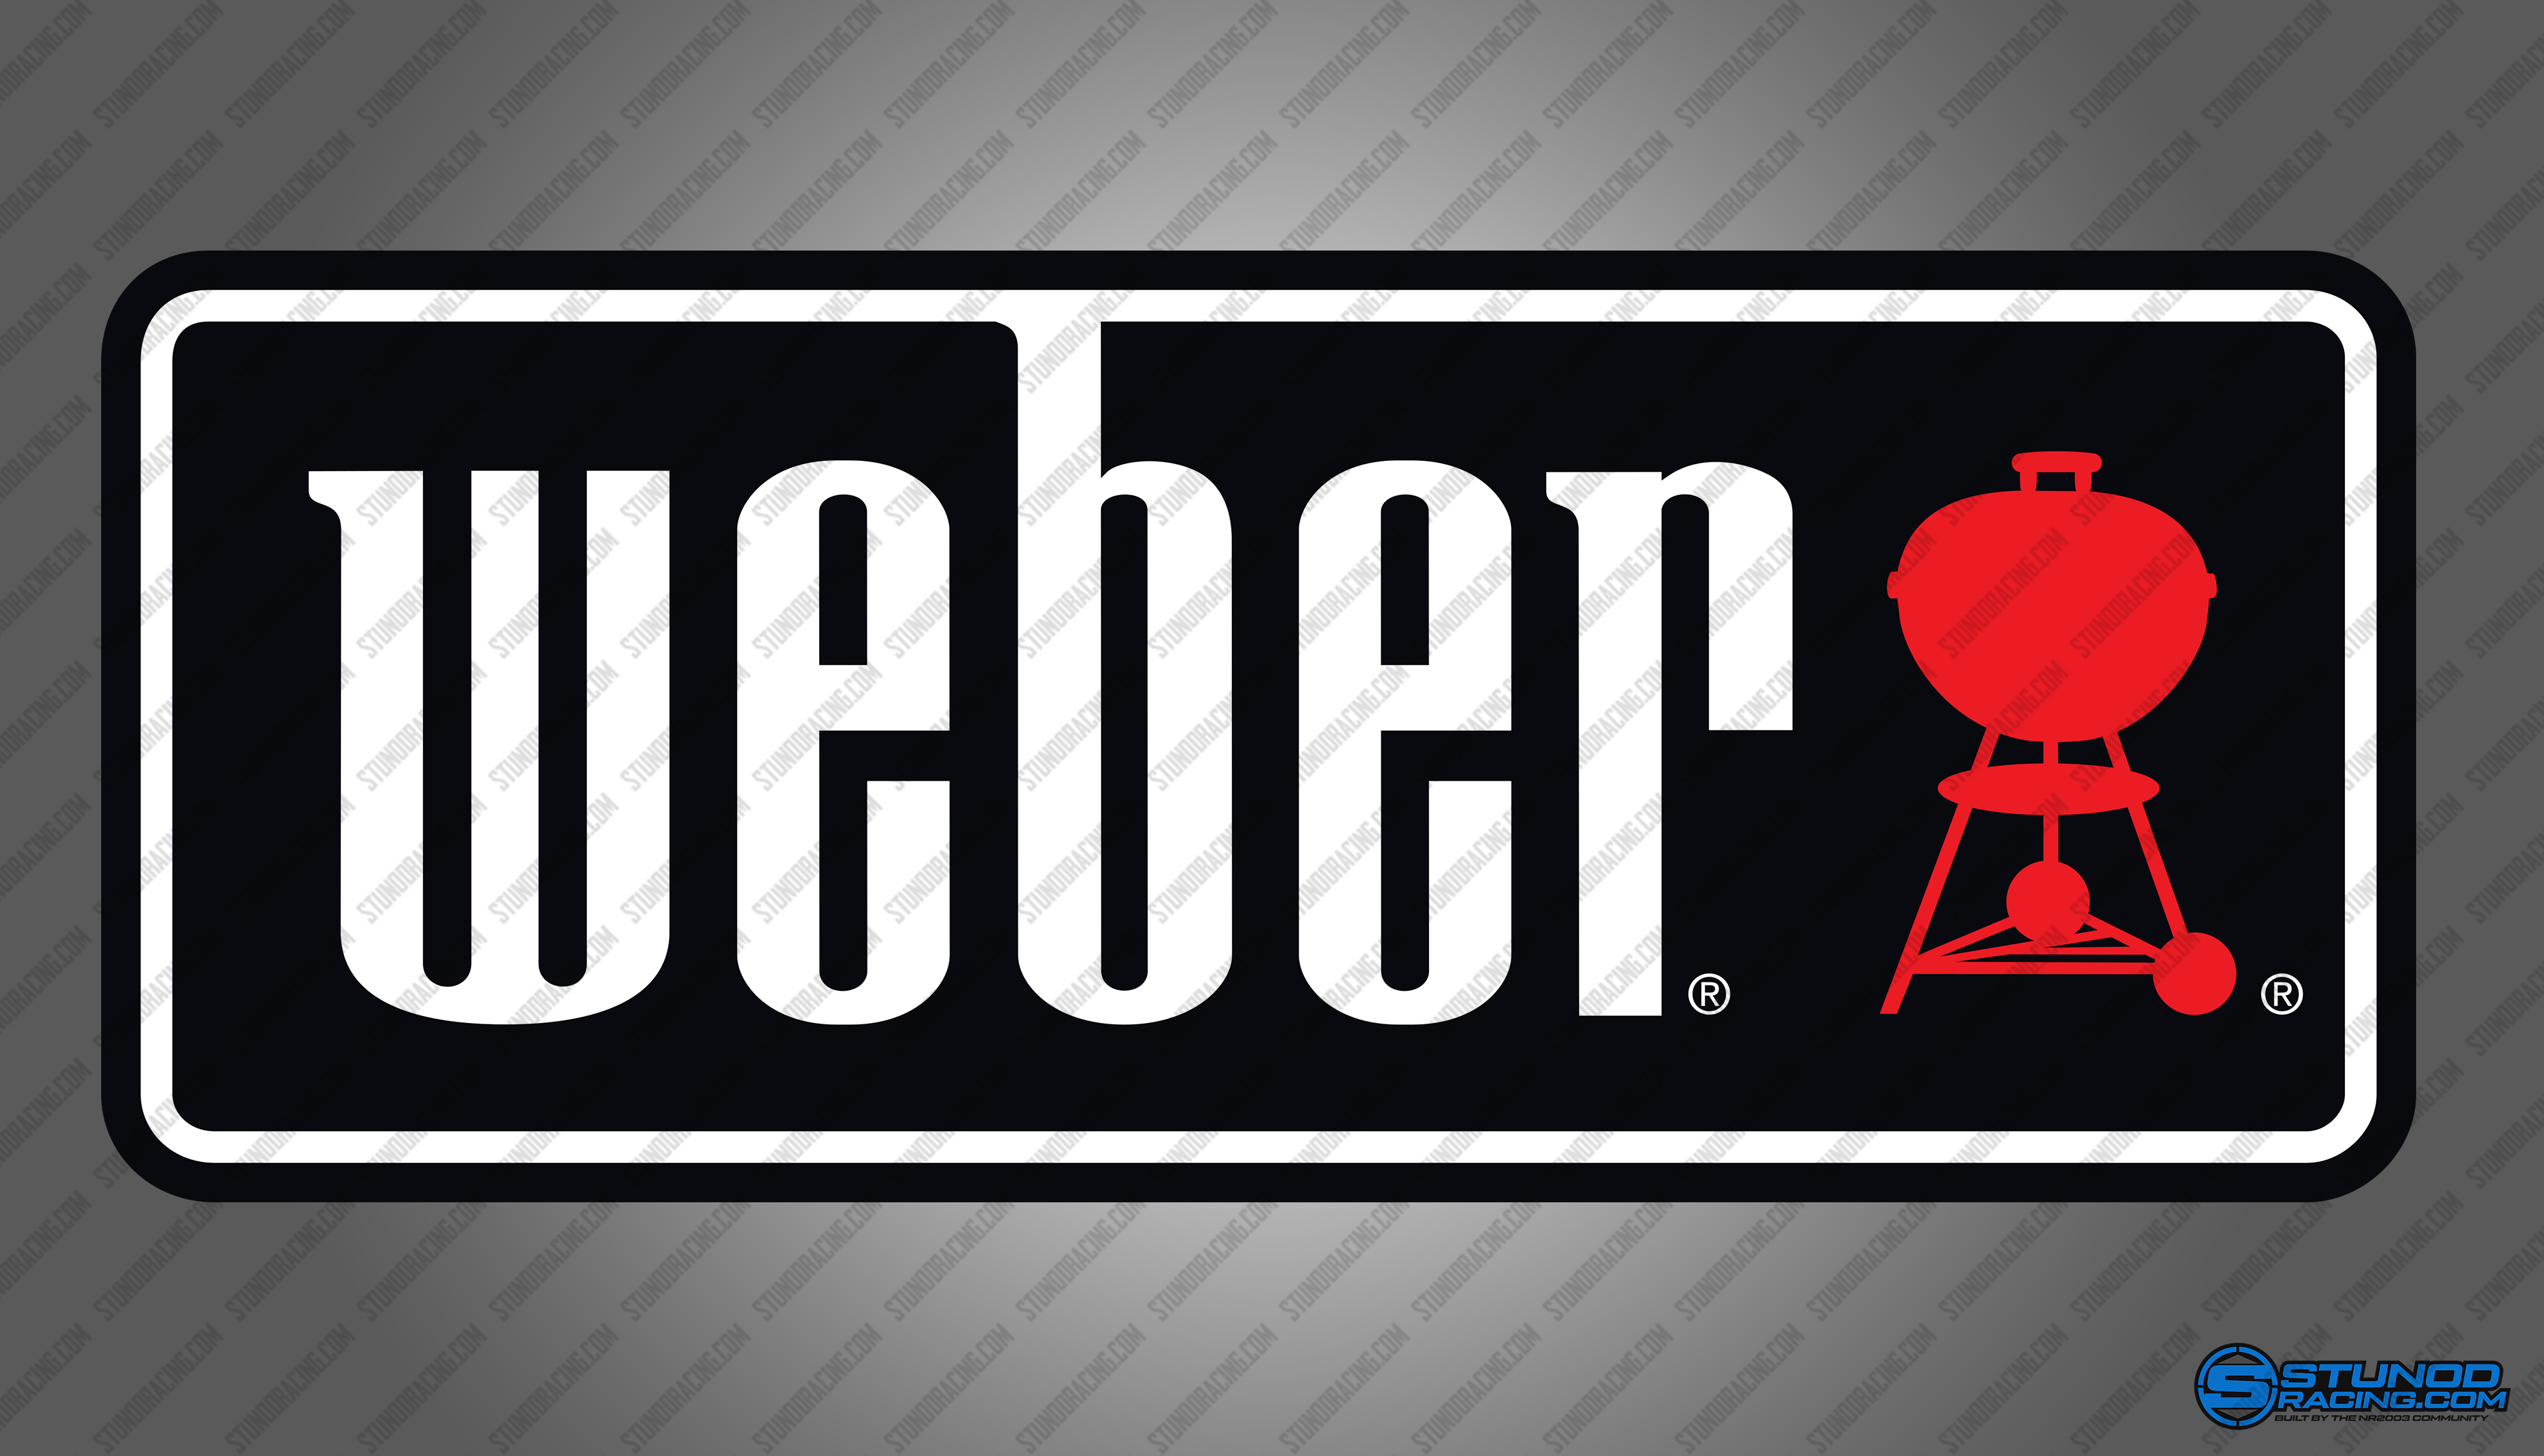 StunodRacing_Weber_Logo.jpg